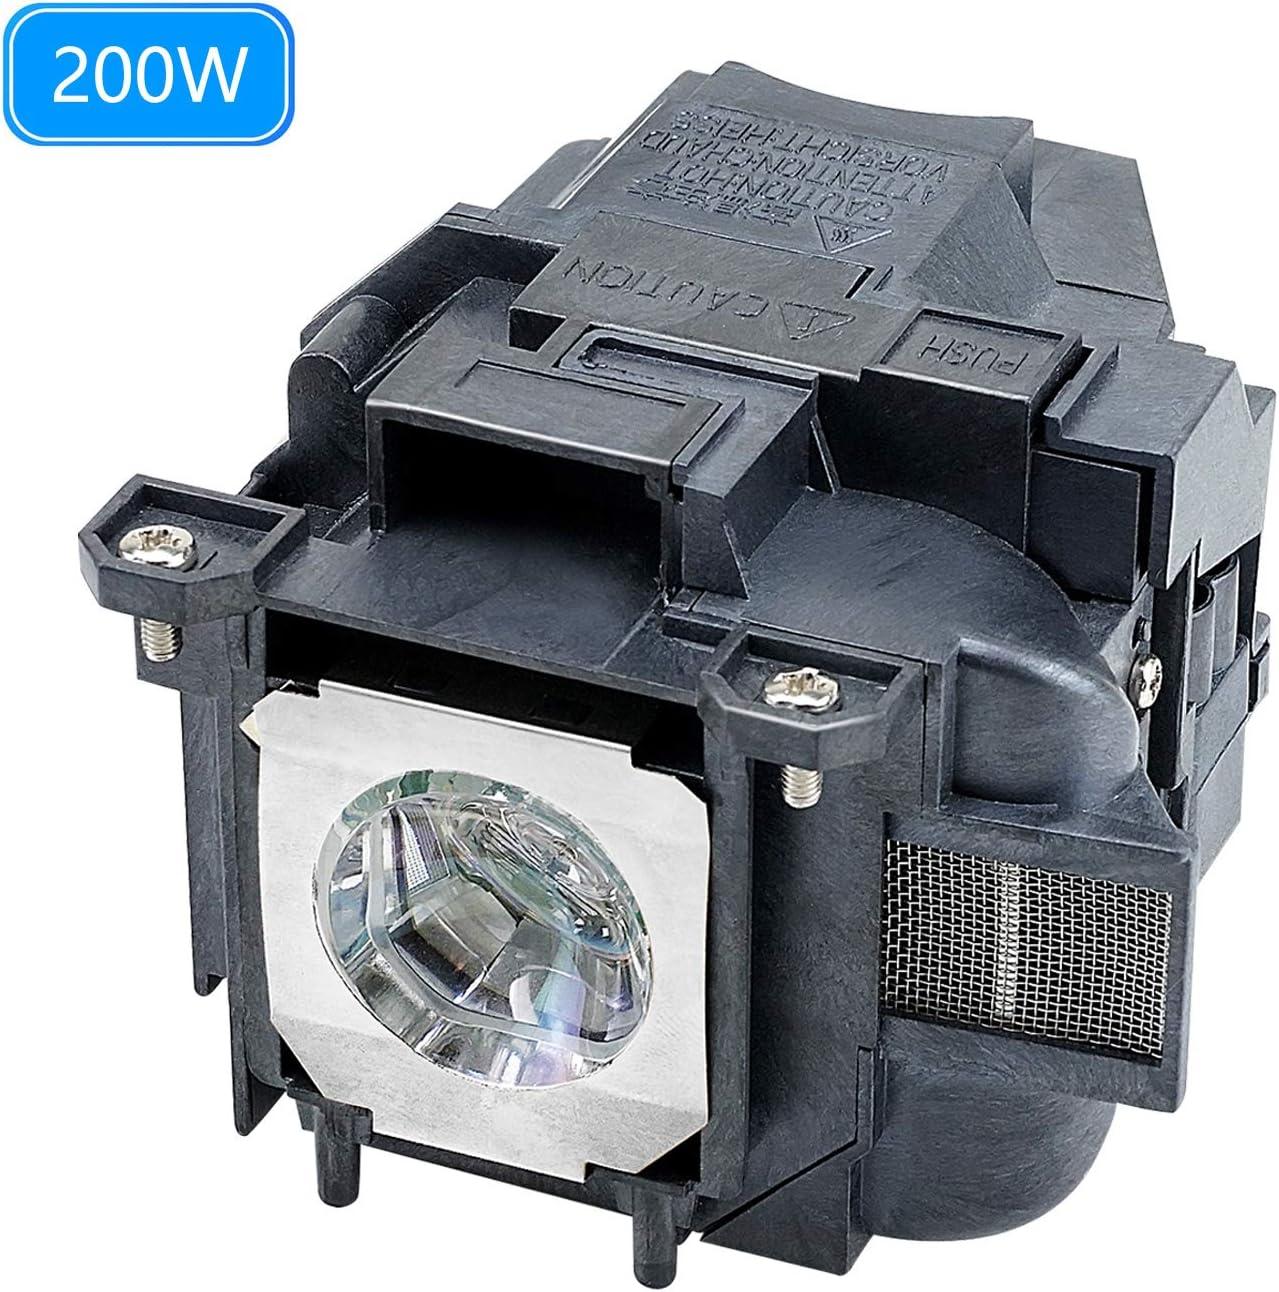 for EX7240 Bulb, ELPLP88 V13H010L88 Replacement Bulb Epson EX3240 EX9200 EX5240 Bulb Home Cinema PowerLite H682 EB-X36 EH-TW5210 EH-TW5300 EH-TW5350 EH-TW5350S EB-X350 EB-X31EB-X300 EB-X29 EB-X27